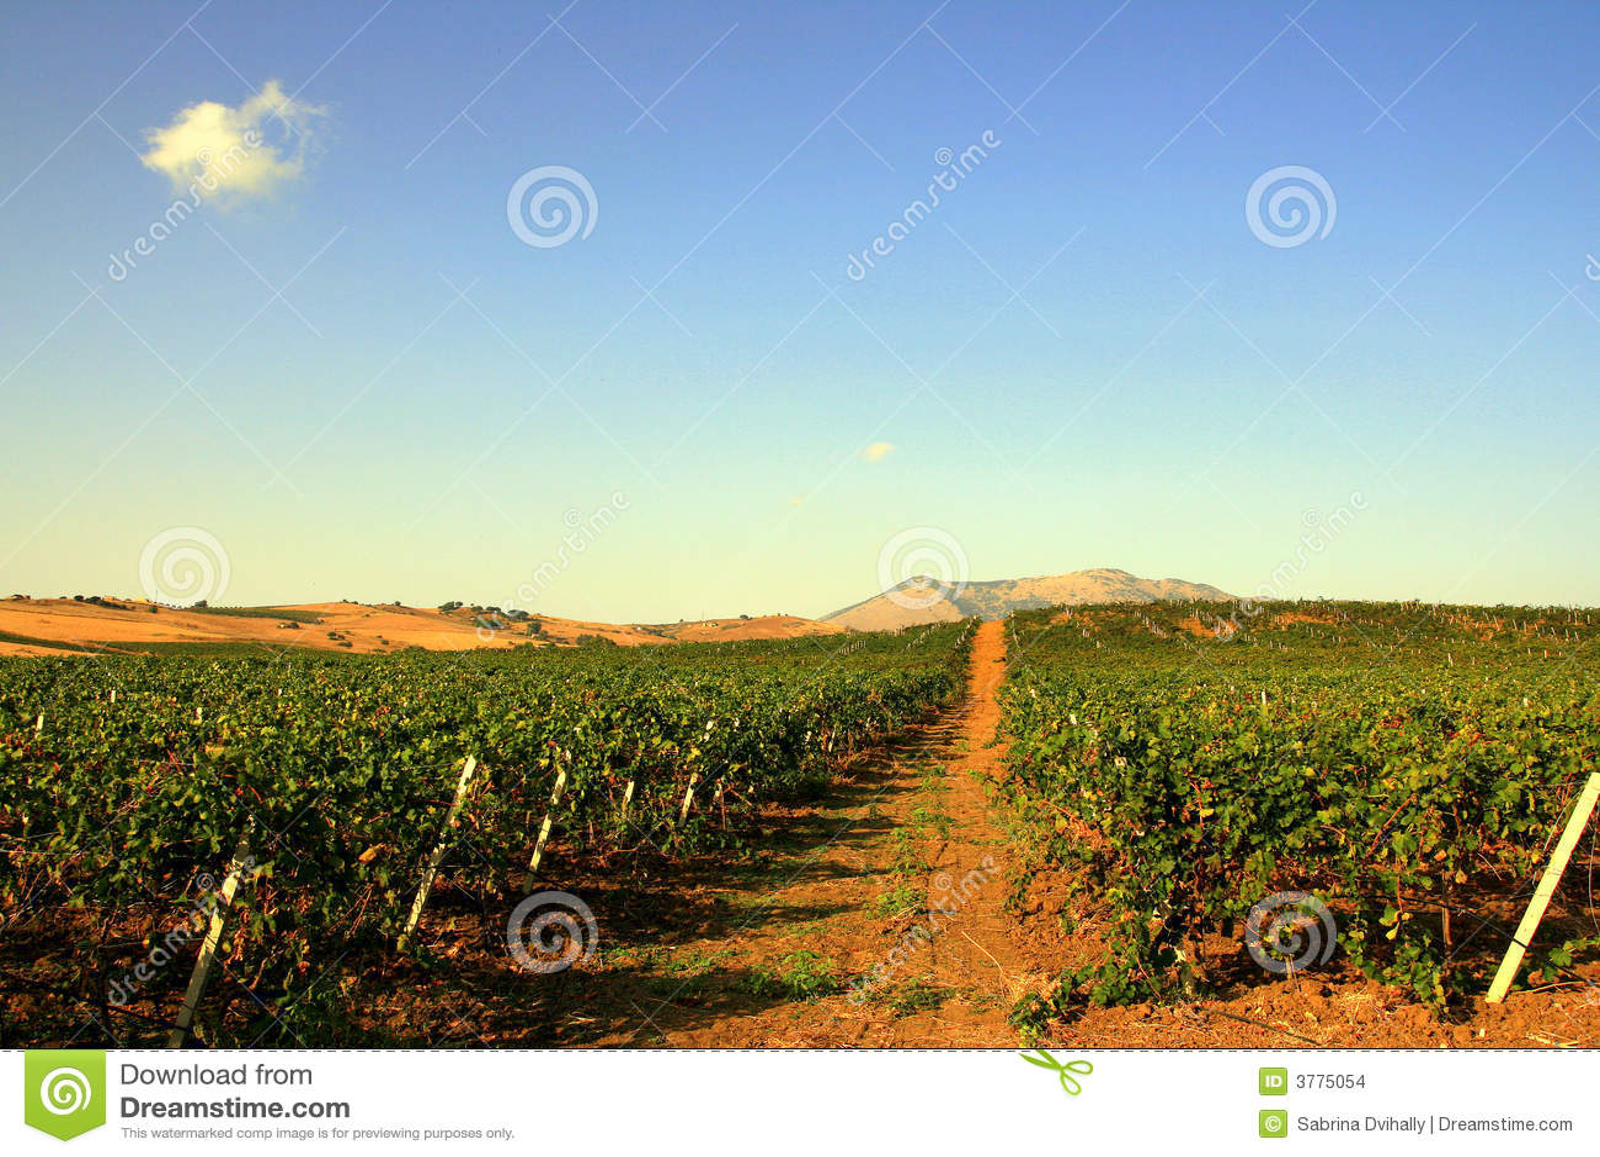 Vineyards & Sky, Sicily